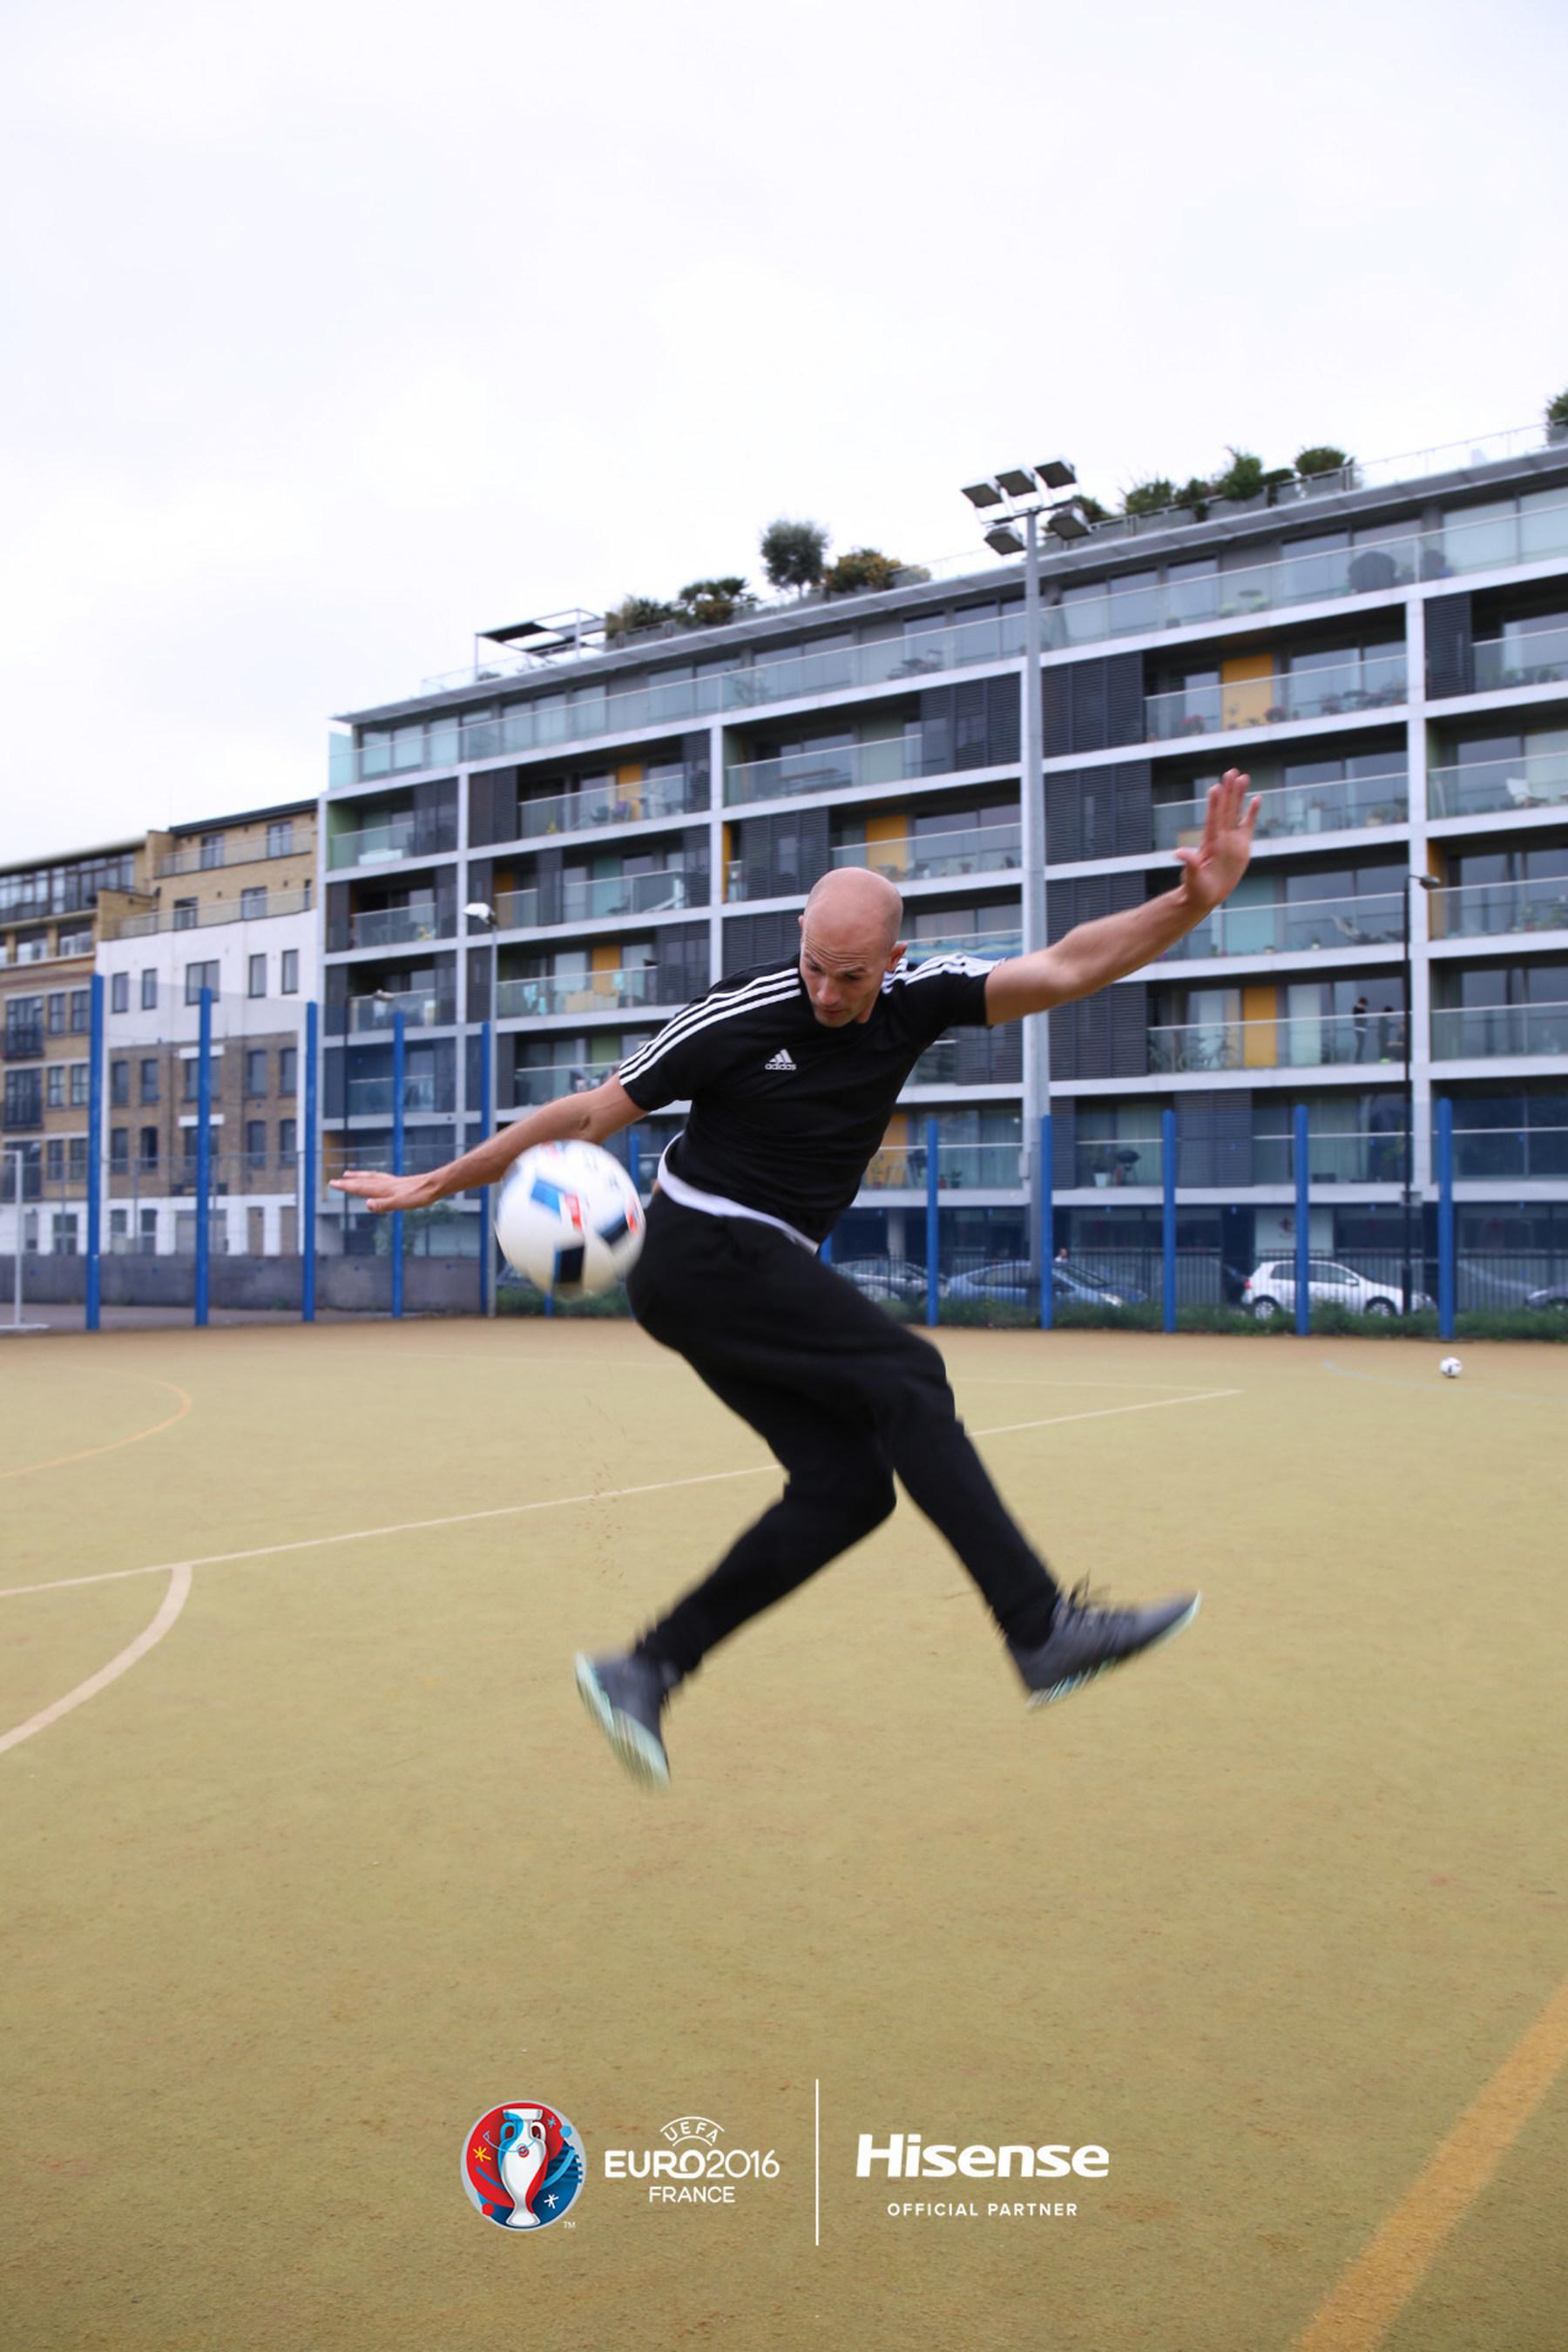 Rule'm Sports' Daniel Cutting films for Hisense in London